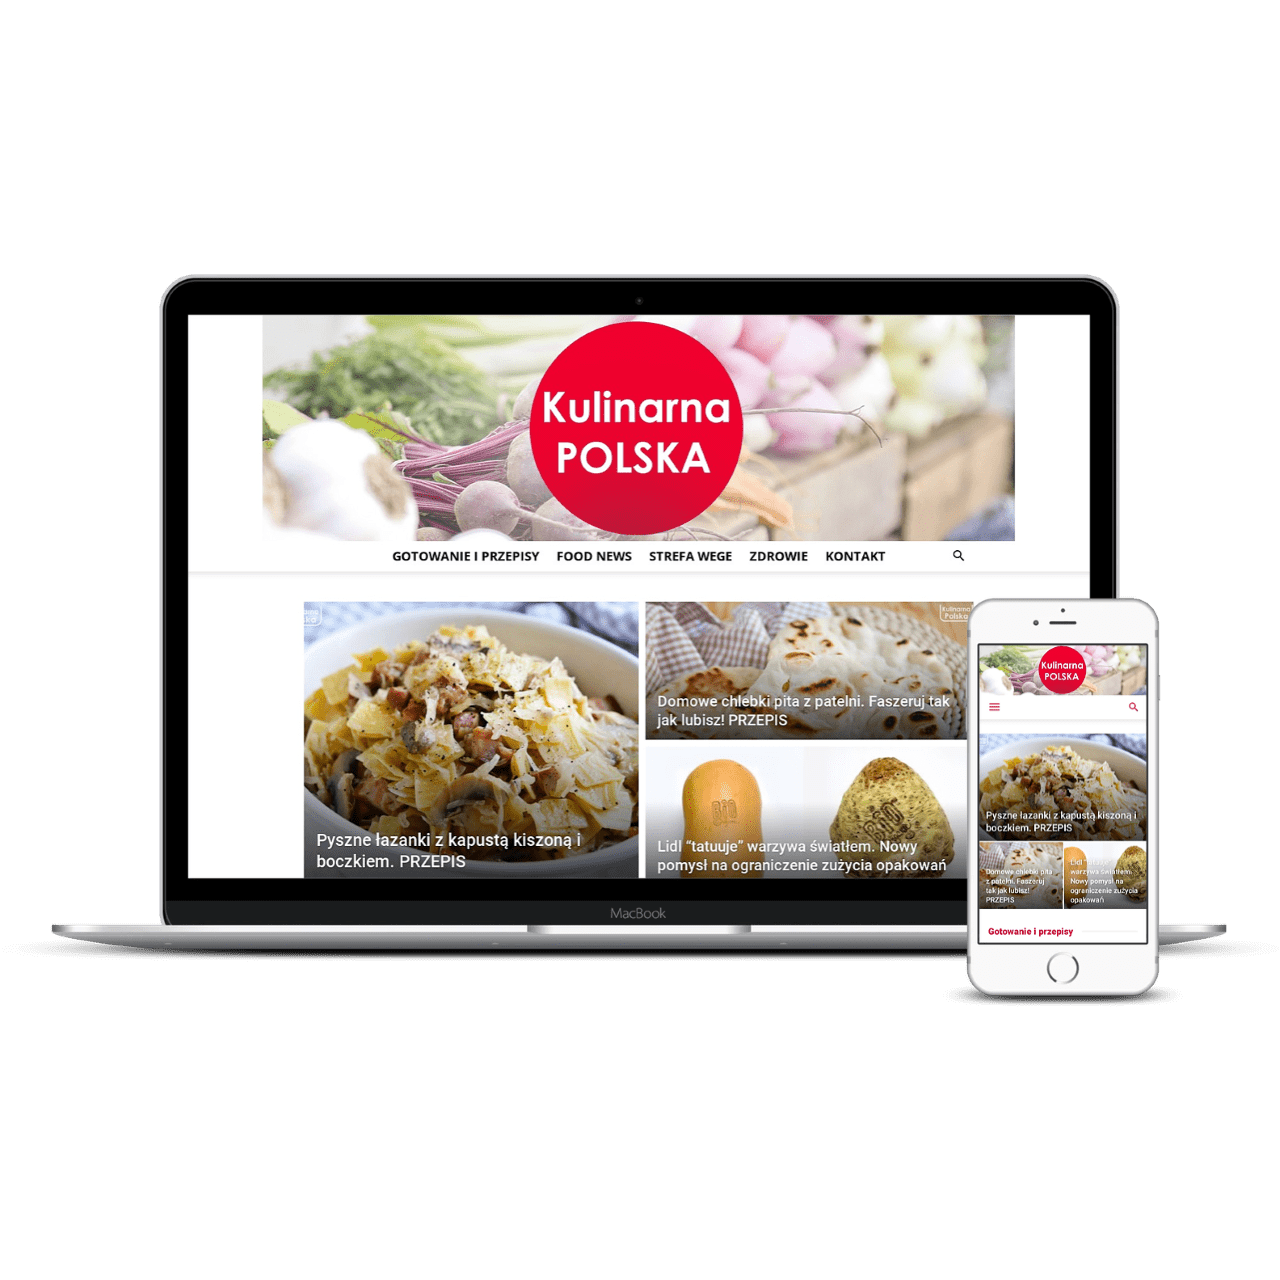 KulinarnaPolska website